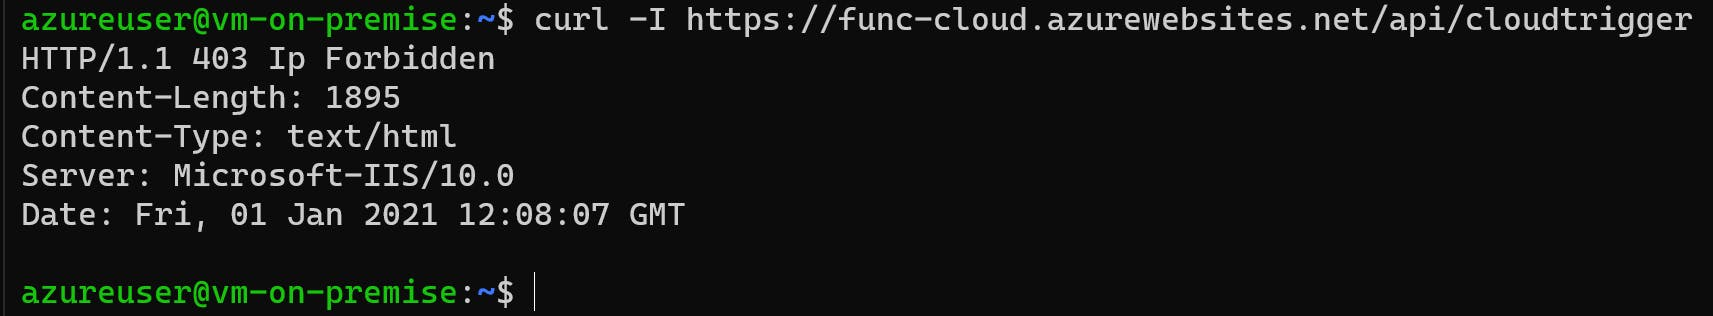 peering-function-cloud-forbidden-shell-vm-onpremise.png